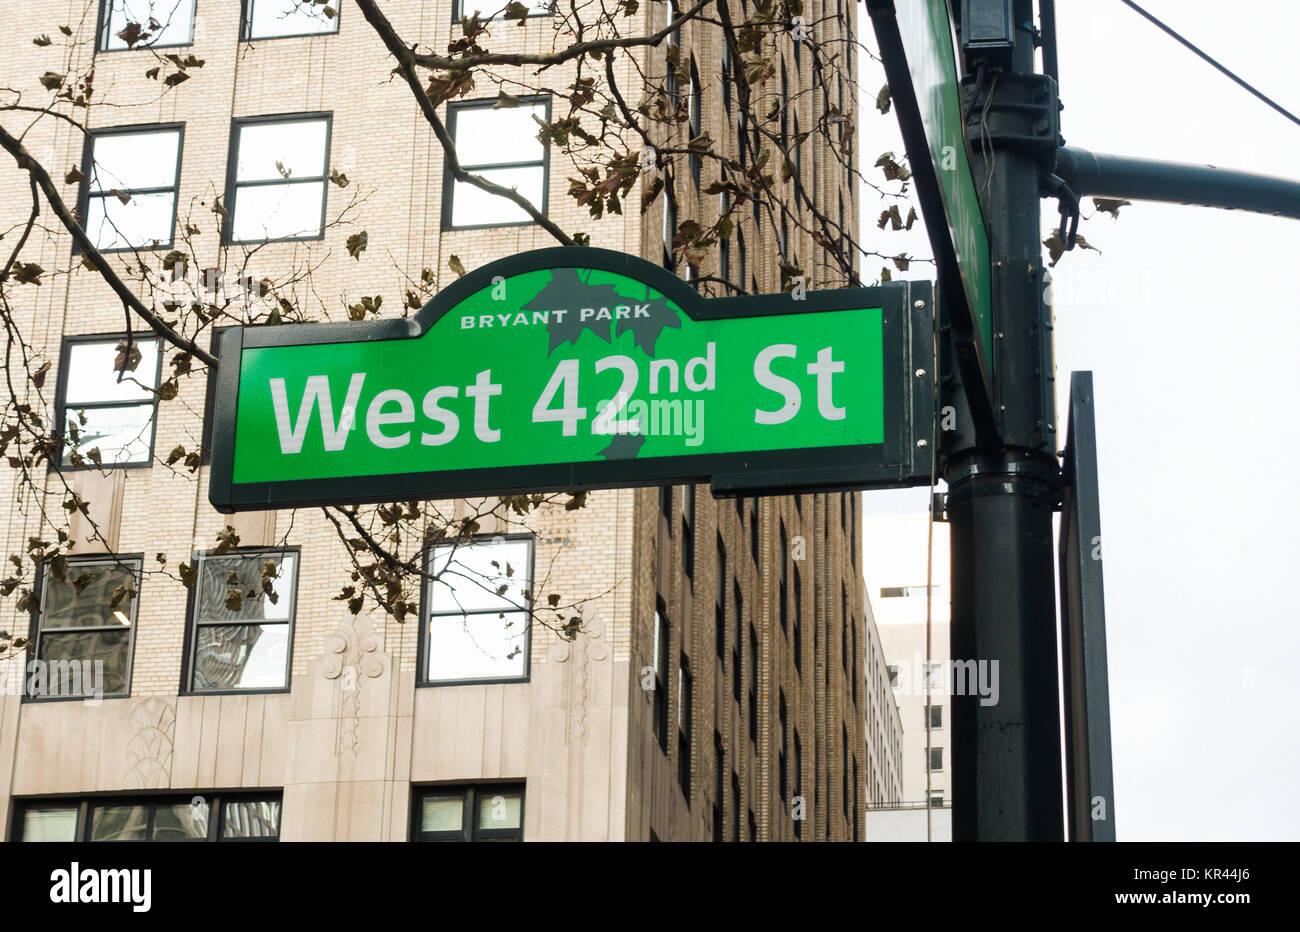 West 42nd Street Stock Photos & West 42nd Street Stock ...